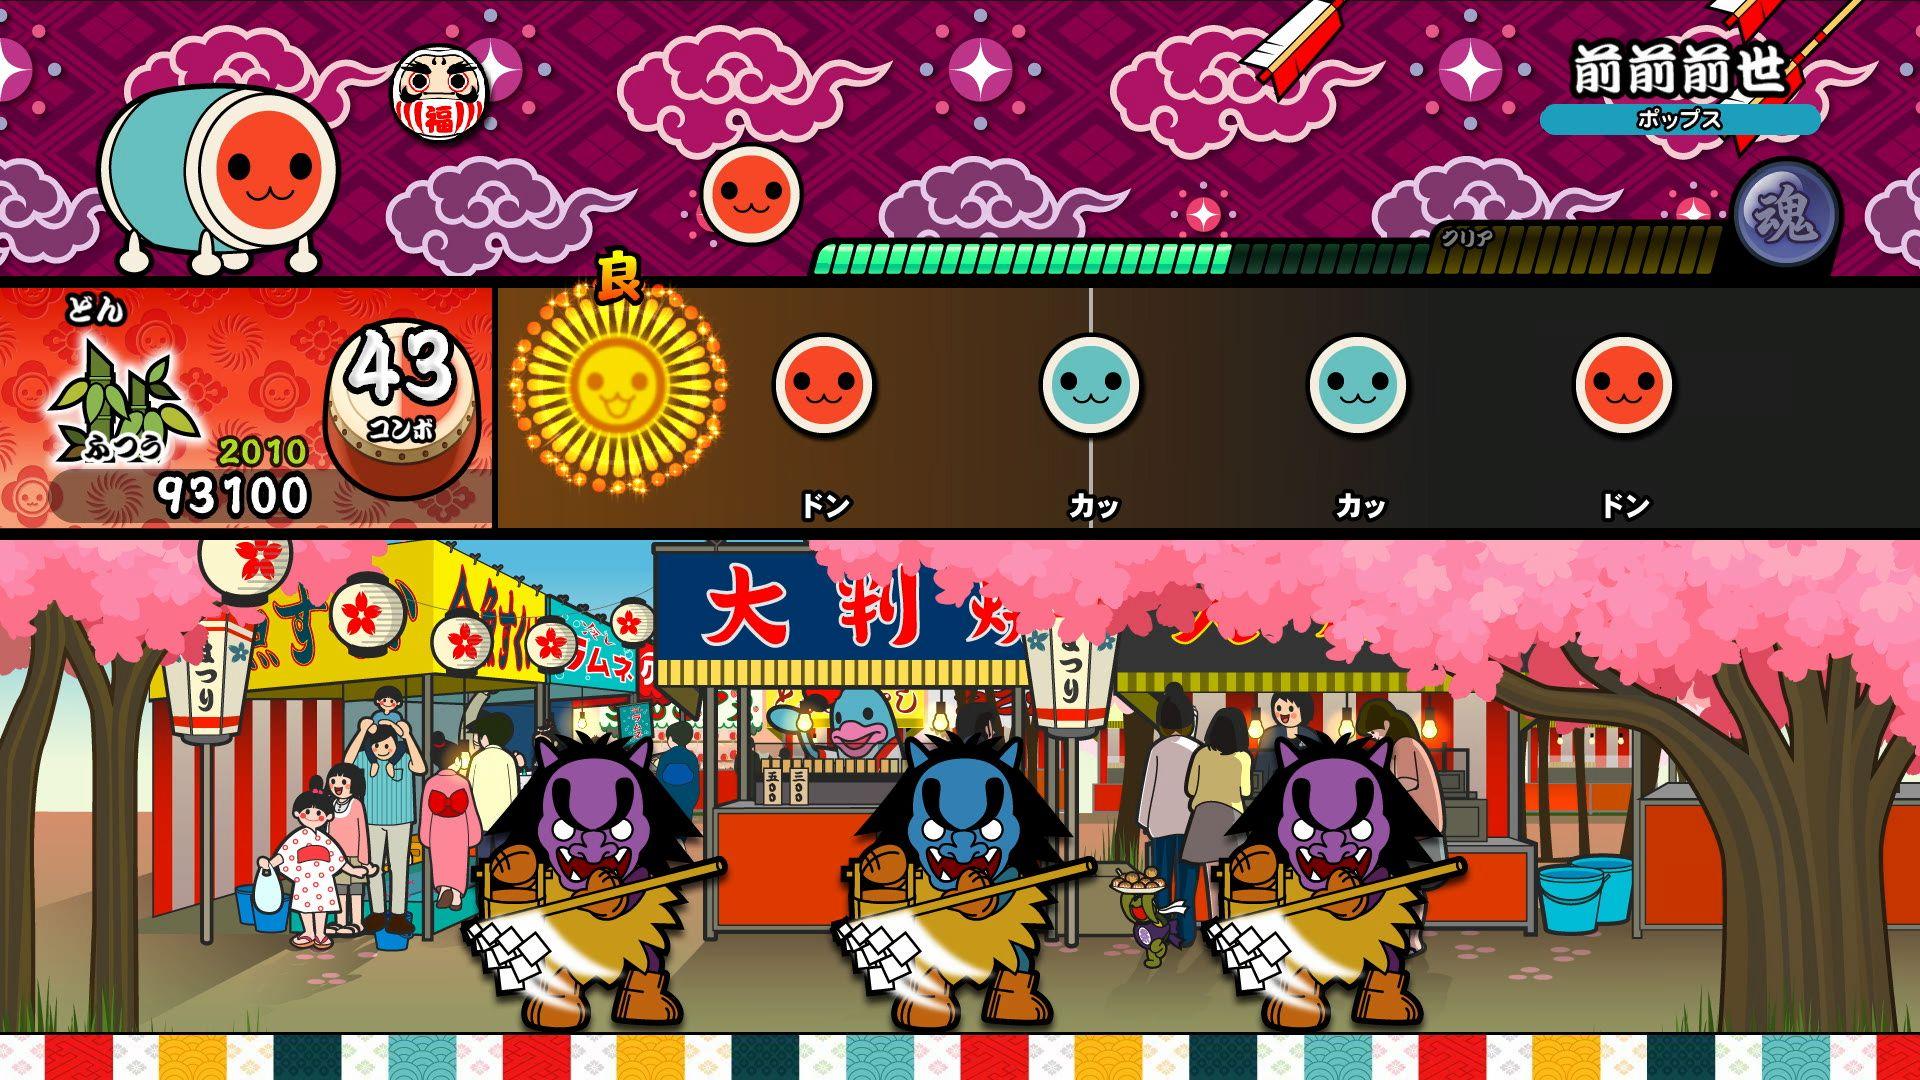 First Taiko Drum Master Nintendo Switch Version Details